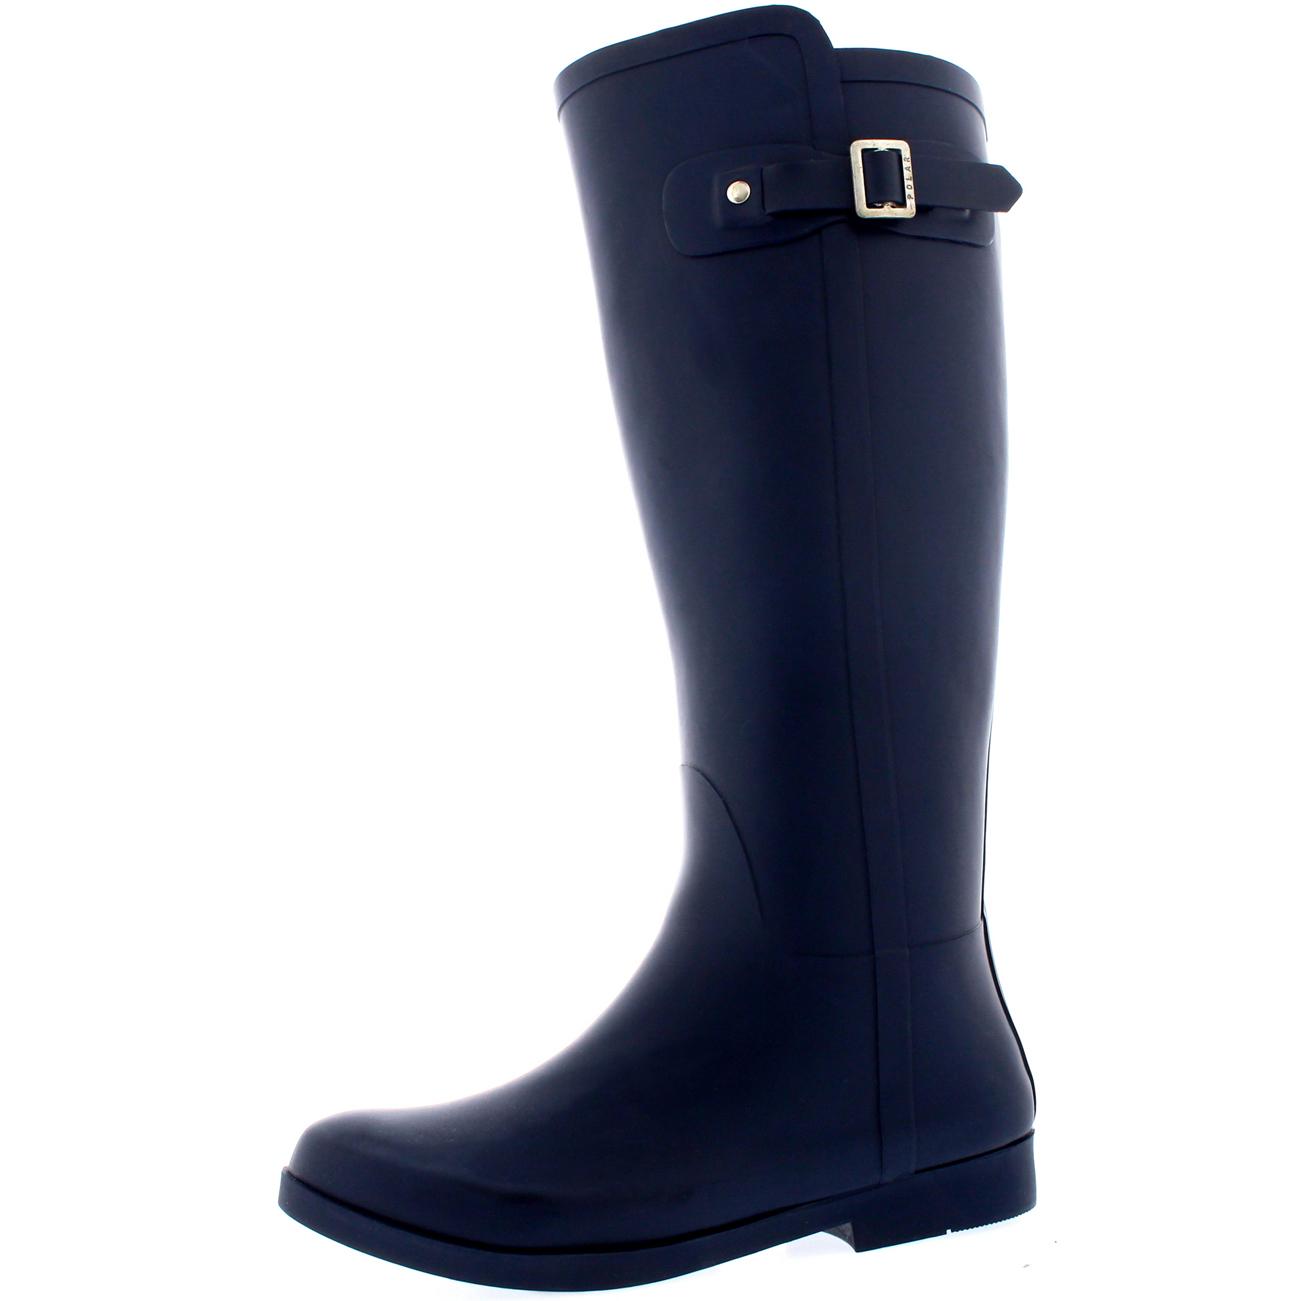 Waterproof Dog Shoes Uk